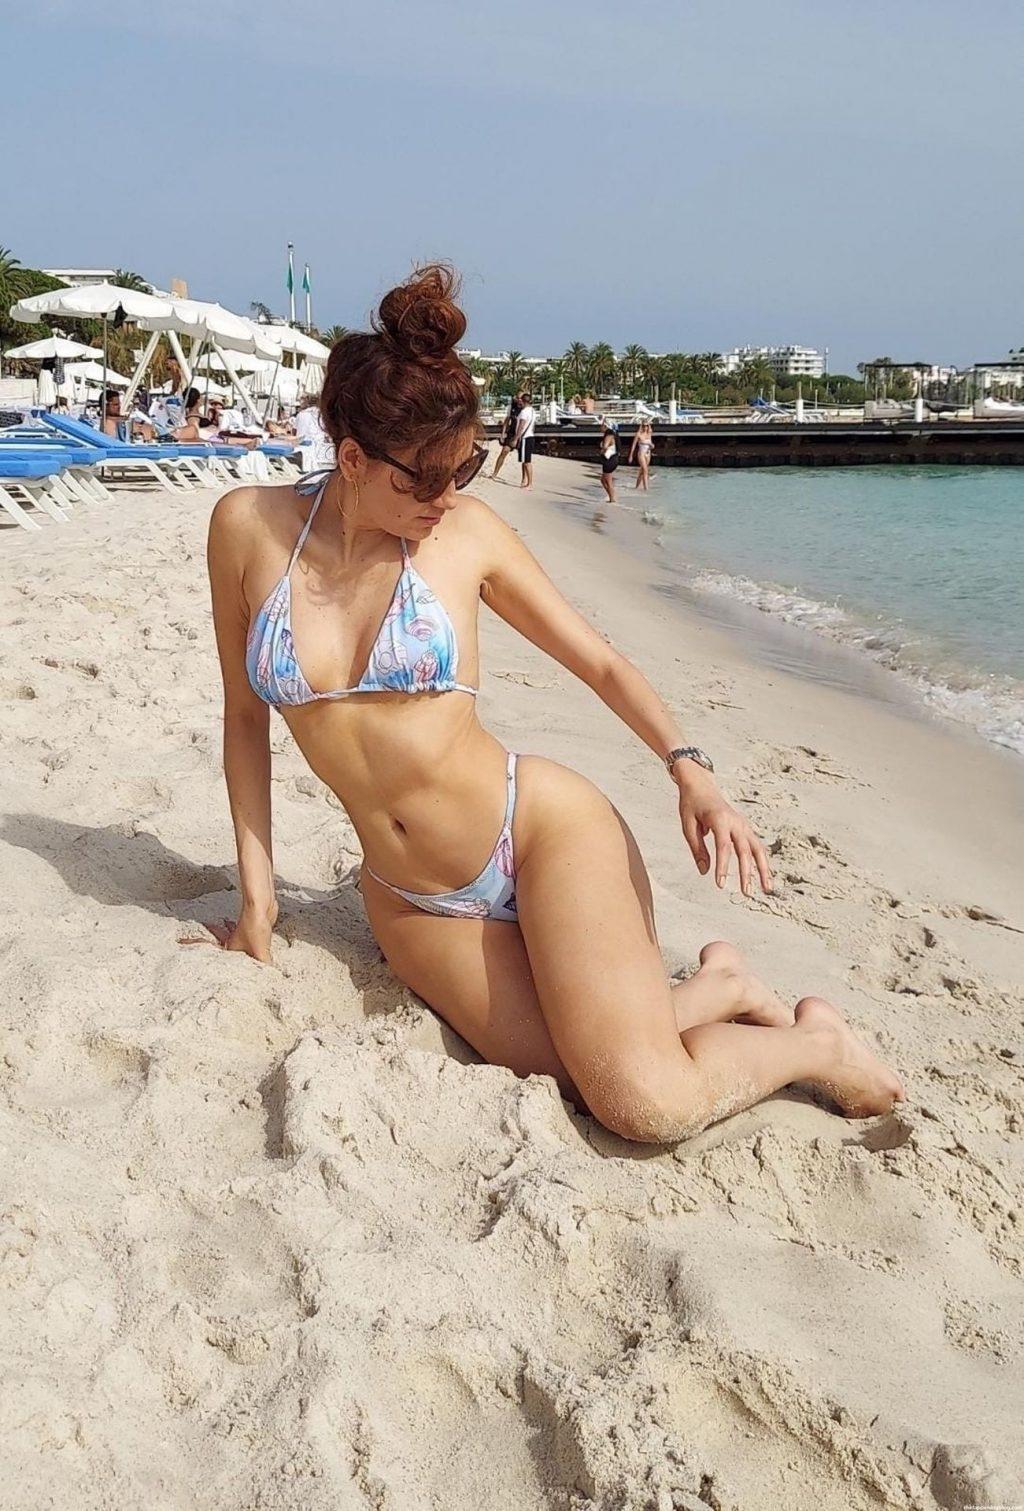 Blanca Blanco Flaunts Her Curves at Cannes Beach (30 Photos)